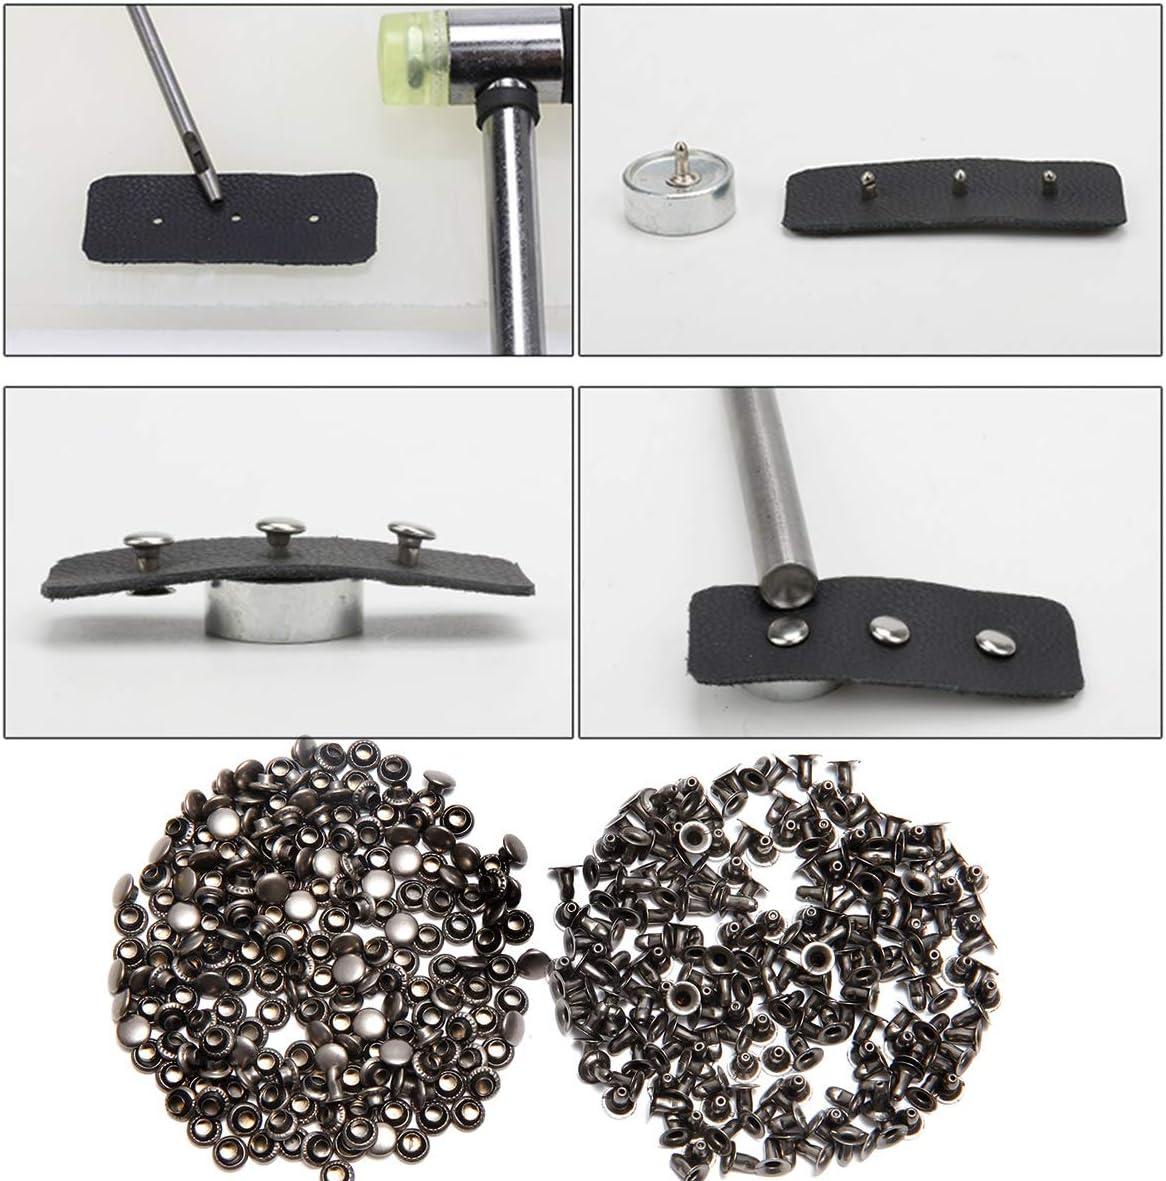 200pcs Leather Rivets Snap Fasteners Kit Single Cap Rapid Rivet Metal Stud Fasteners Round Cap for Bag Belt Wallet Leather Craft Gunmetal Black, 6MM Leather Rivets Kit